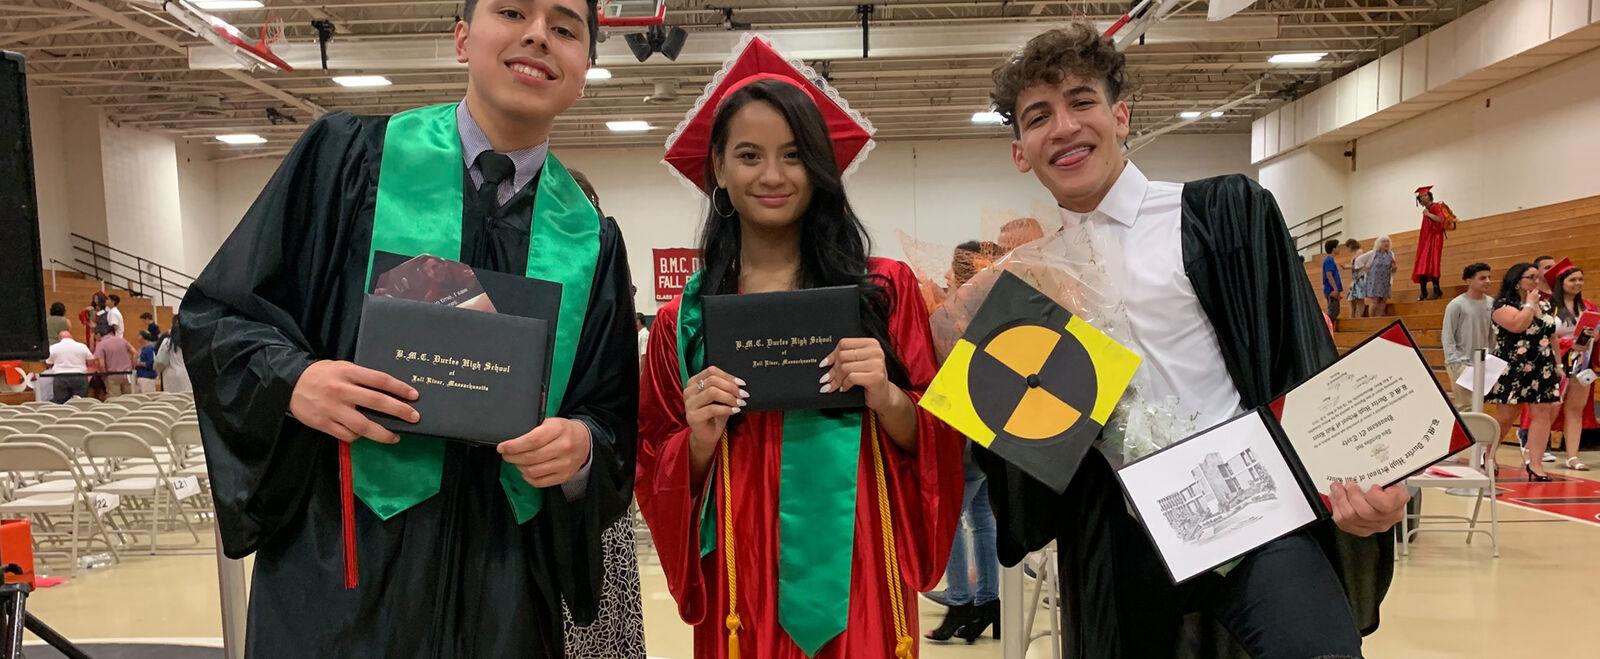 Three students graduate at Fall River high school.